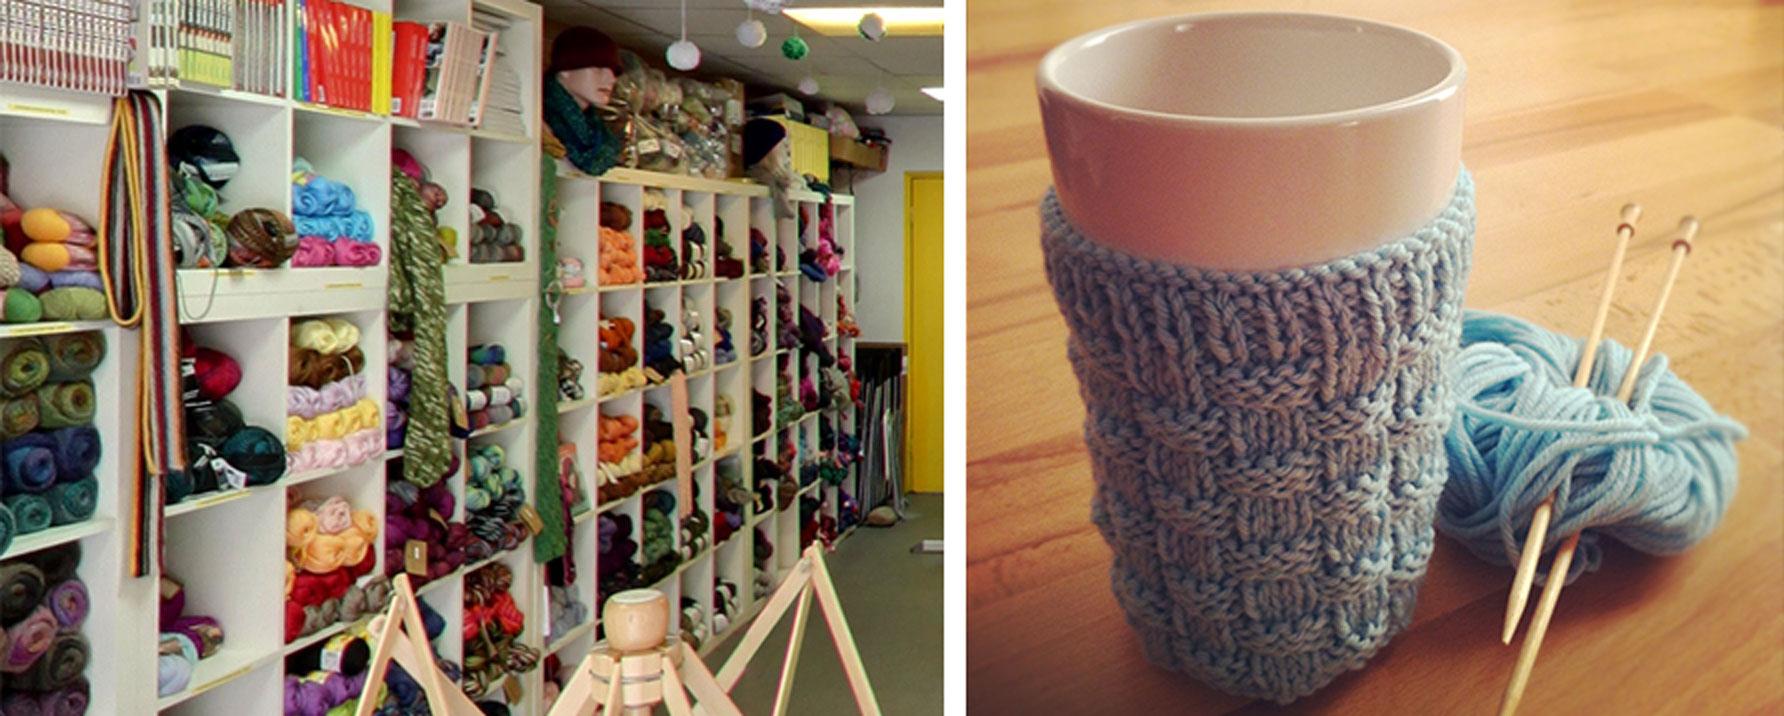 Knitting Events London : I knit london the knitters sanctuary